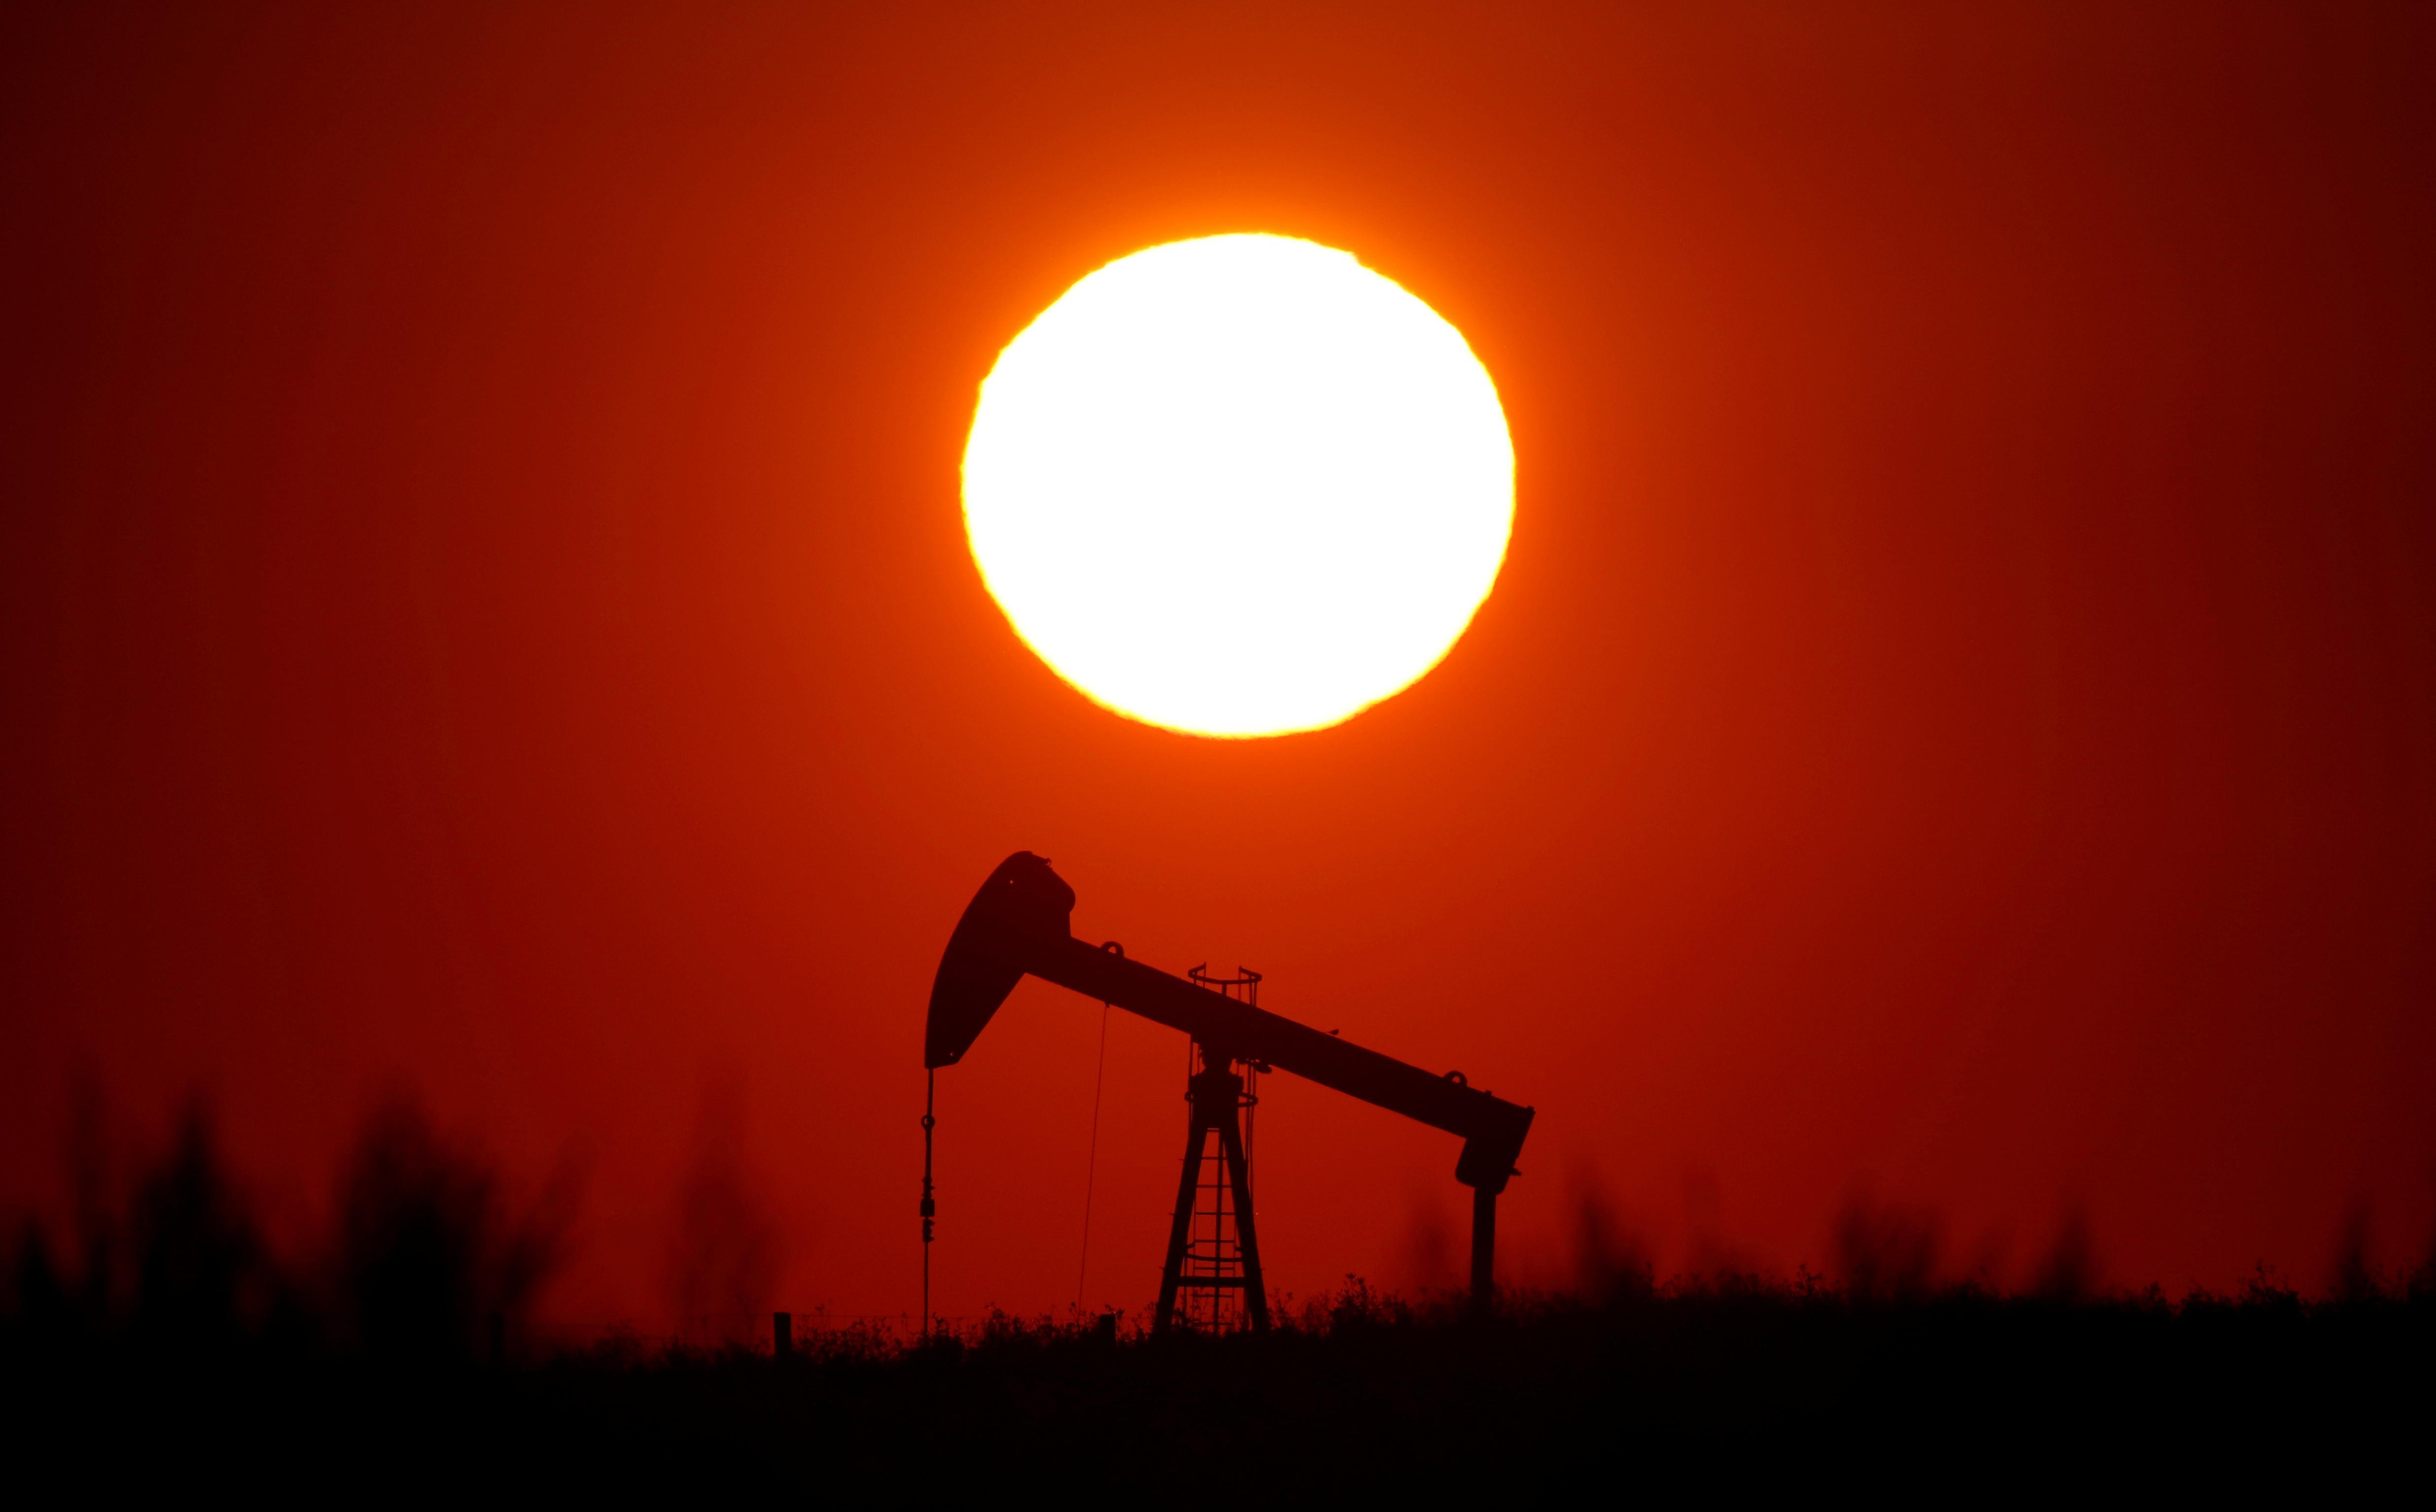 Oil rises 1.4% on hopes OPEC will extend supply cuts, weaker U.S....